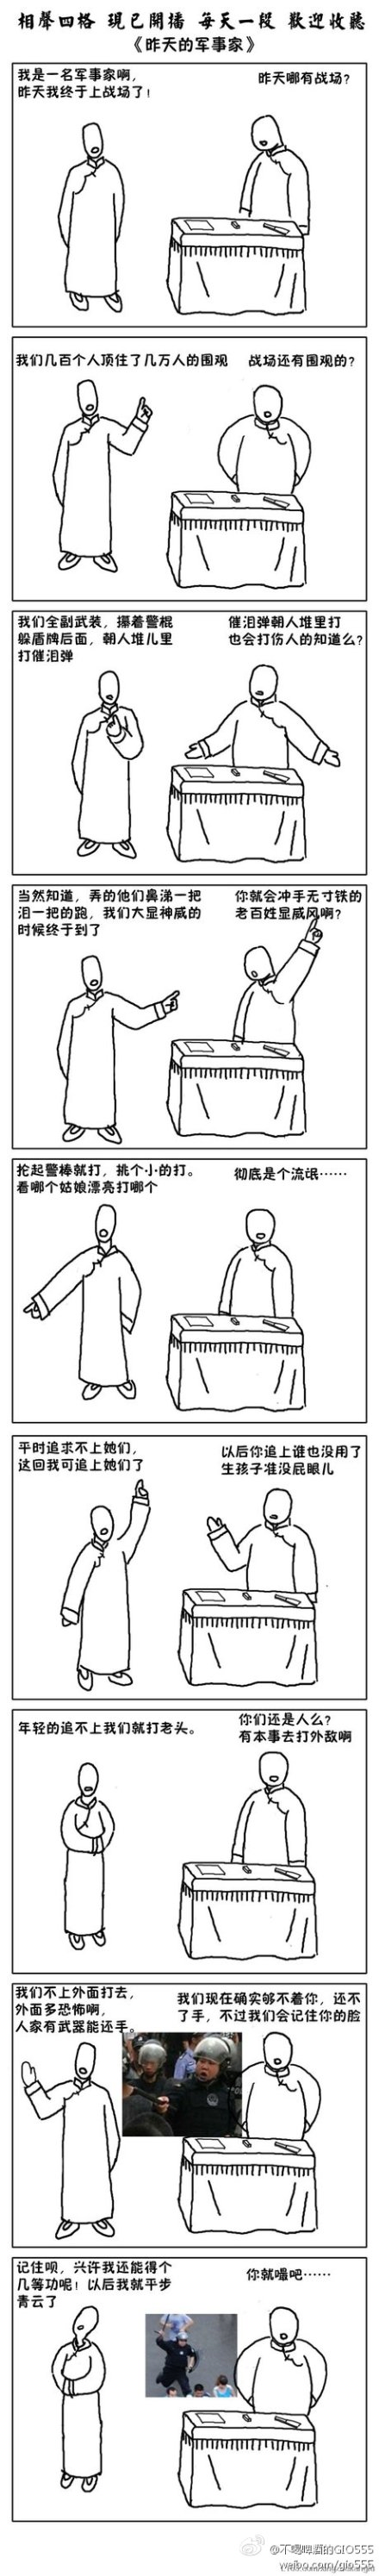 Cross-Talk Comics: The Battle of Shifang